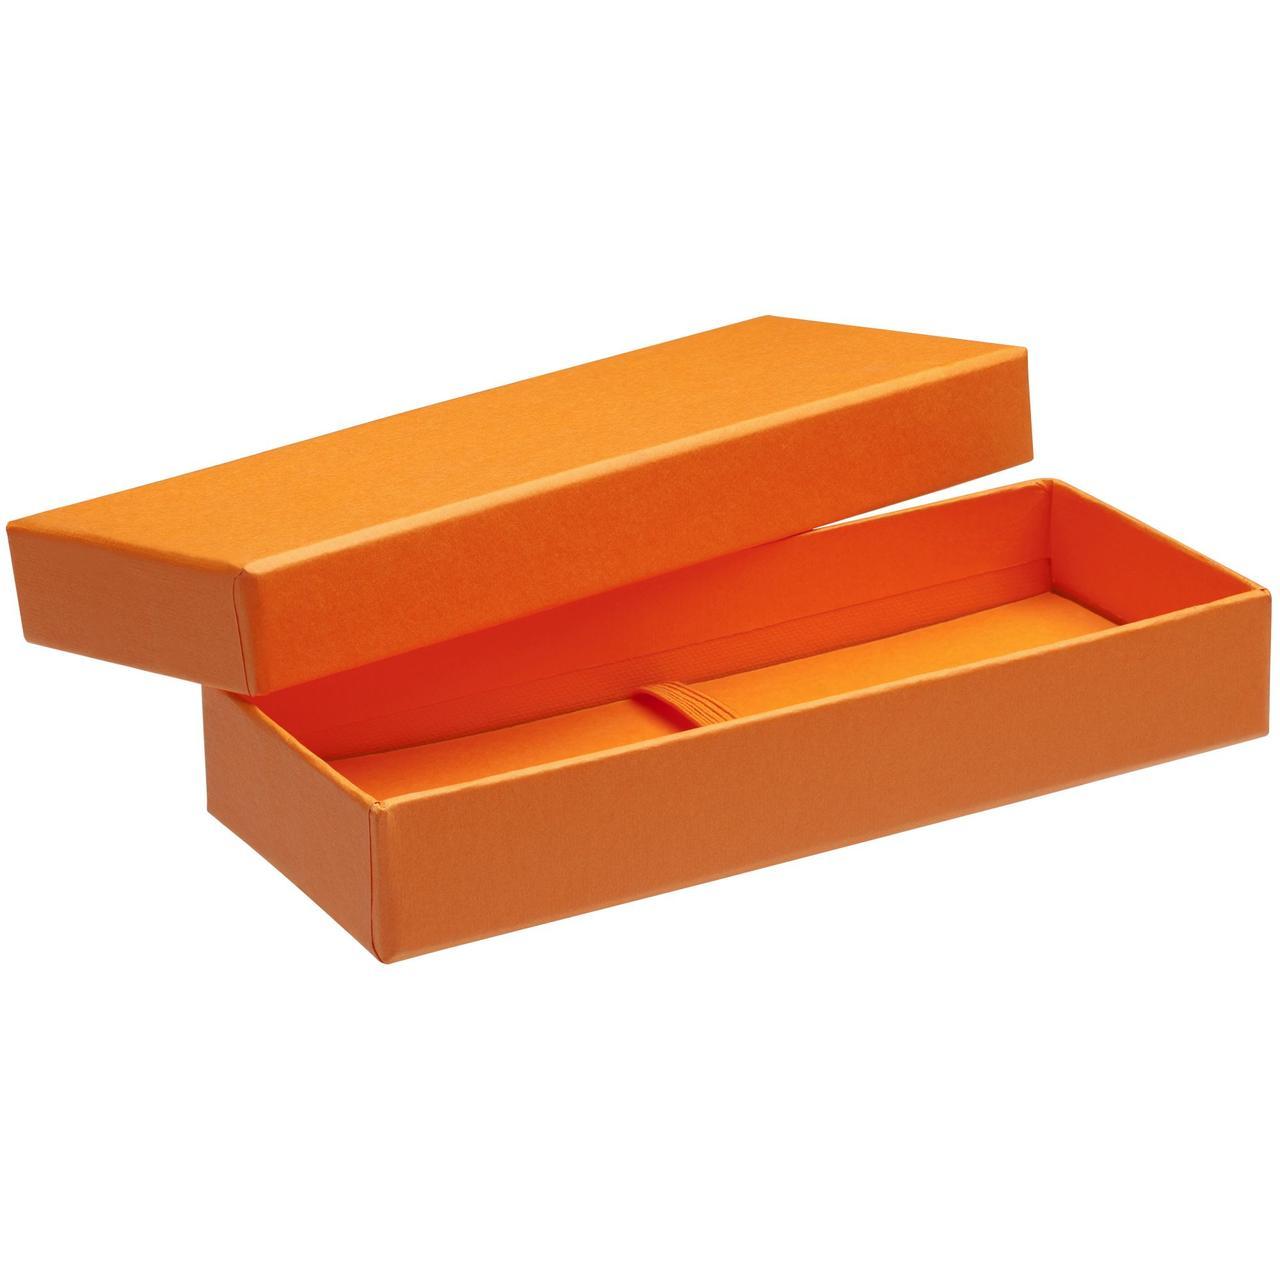 Коробка Tackle, оранжевая (артикул 7956.20)